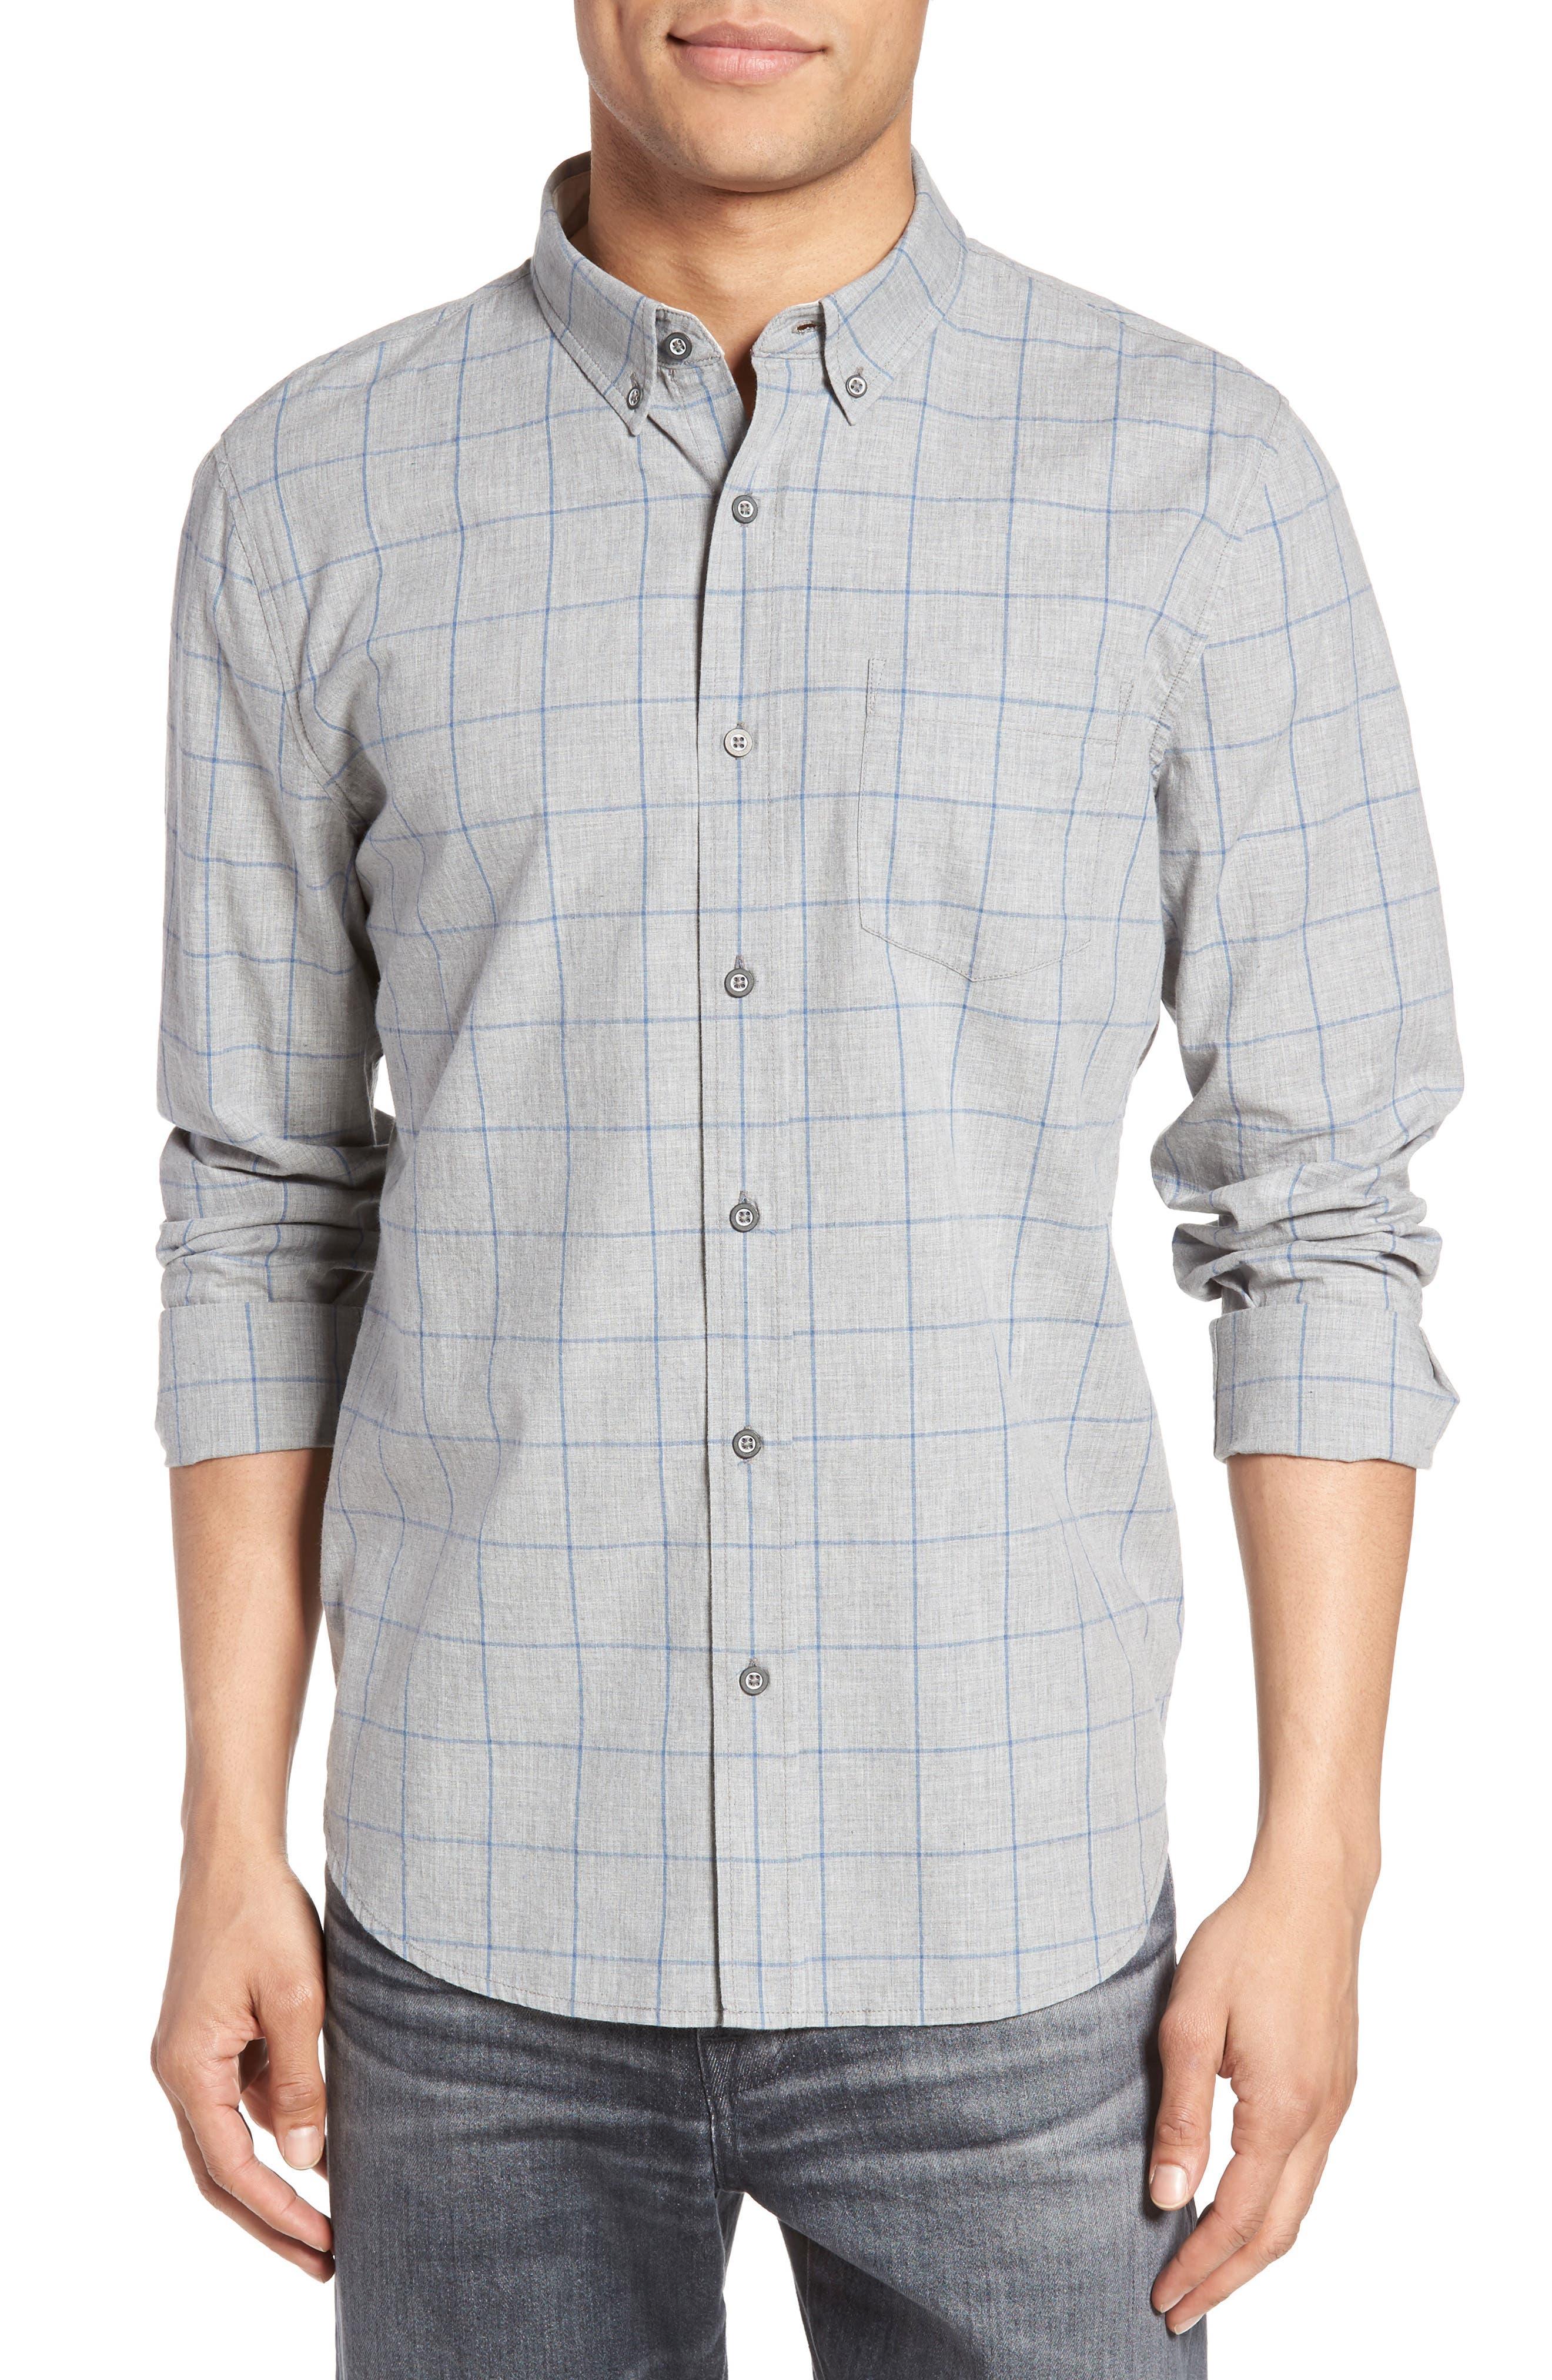 Main Image - AG Grady Cotton Sport Shirt